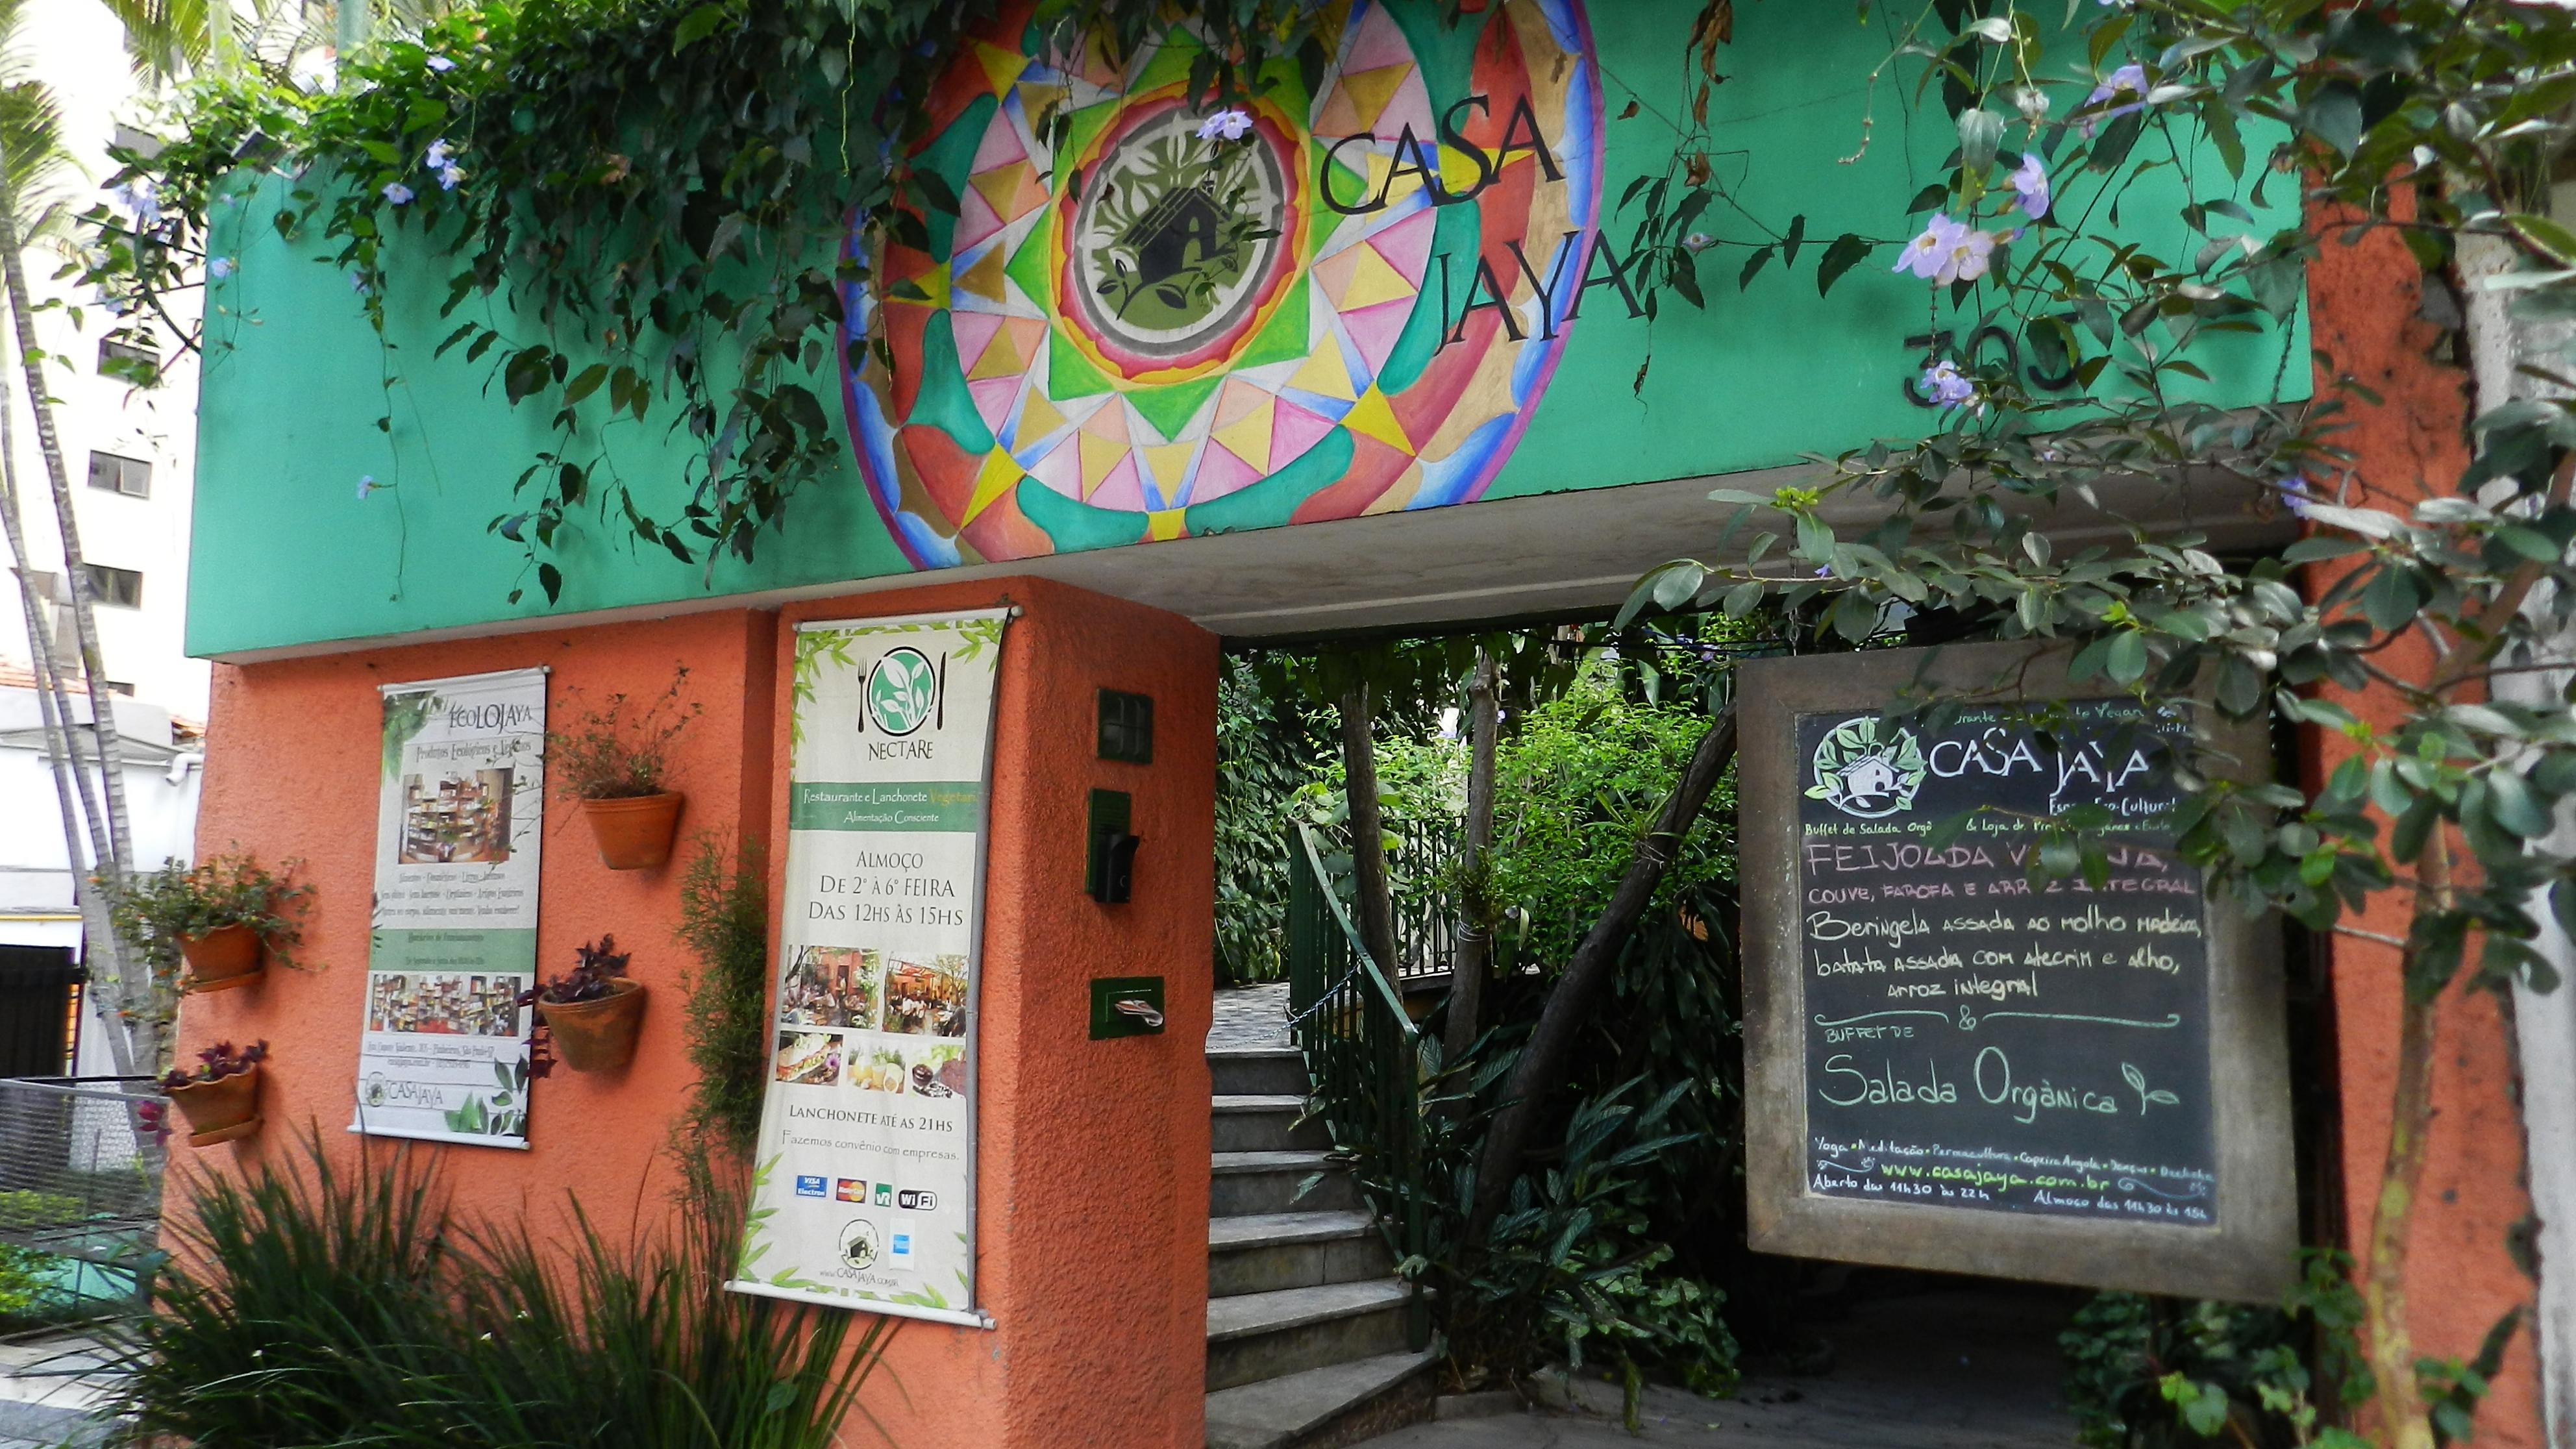 Casa Jaya – Espaço Eco-Cultural